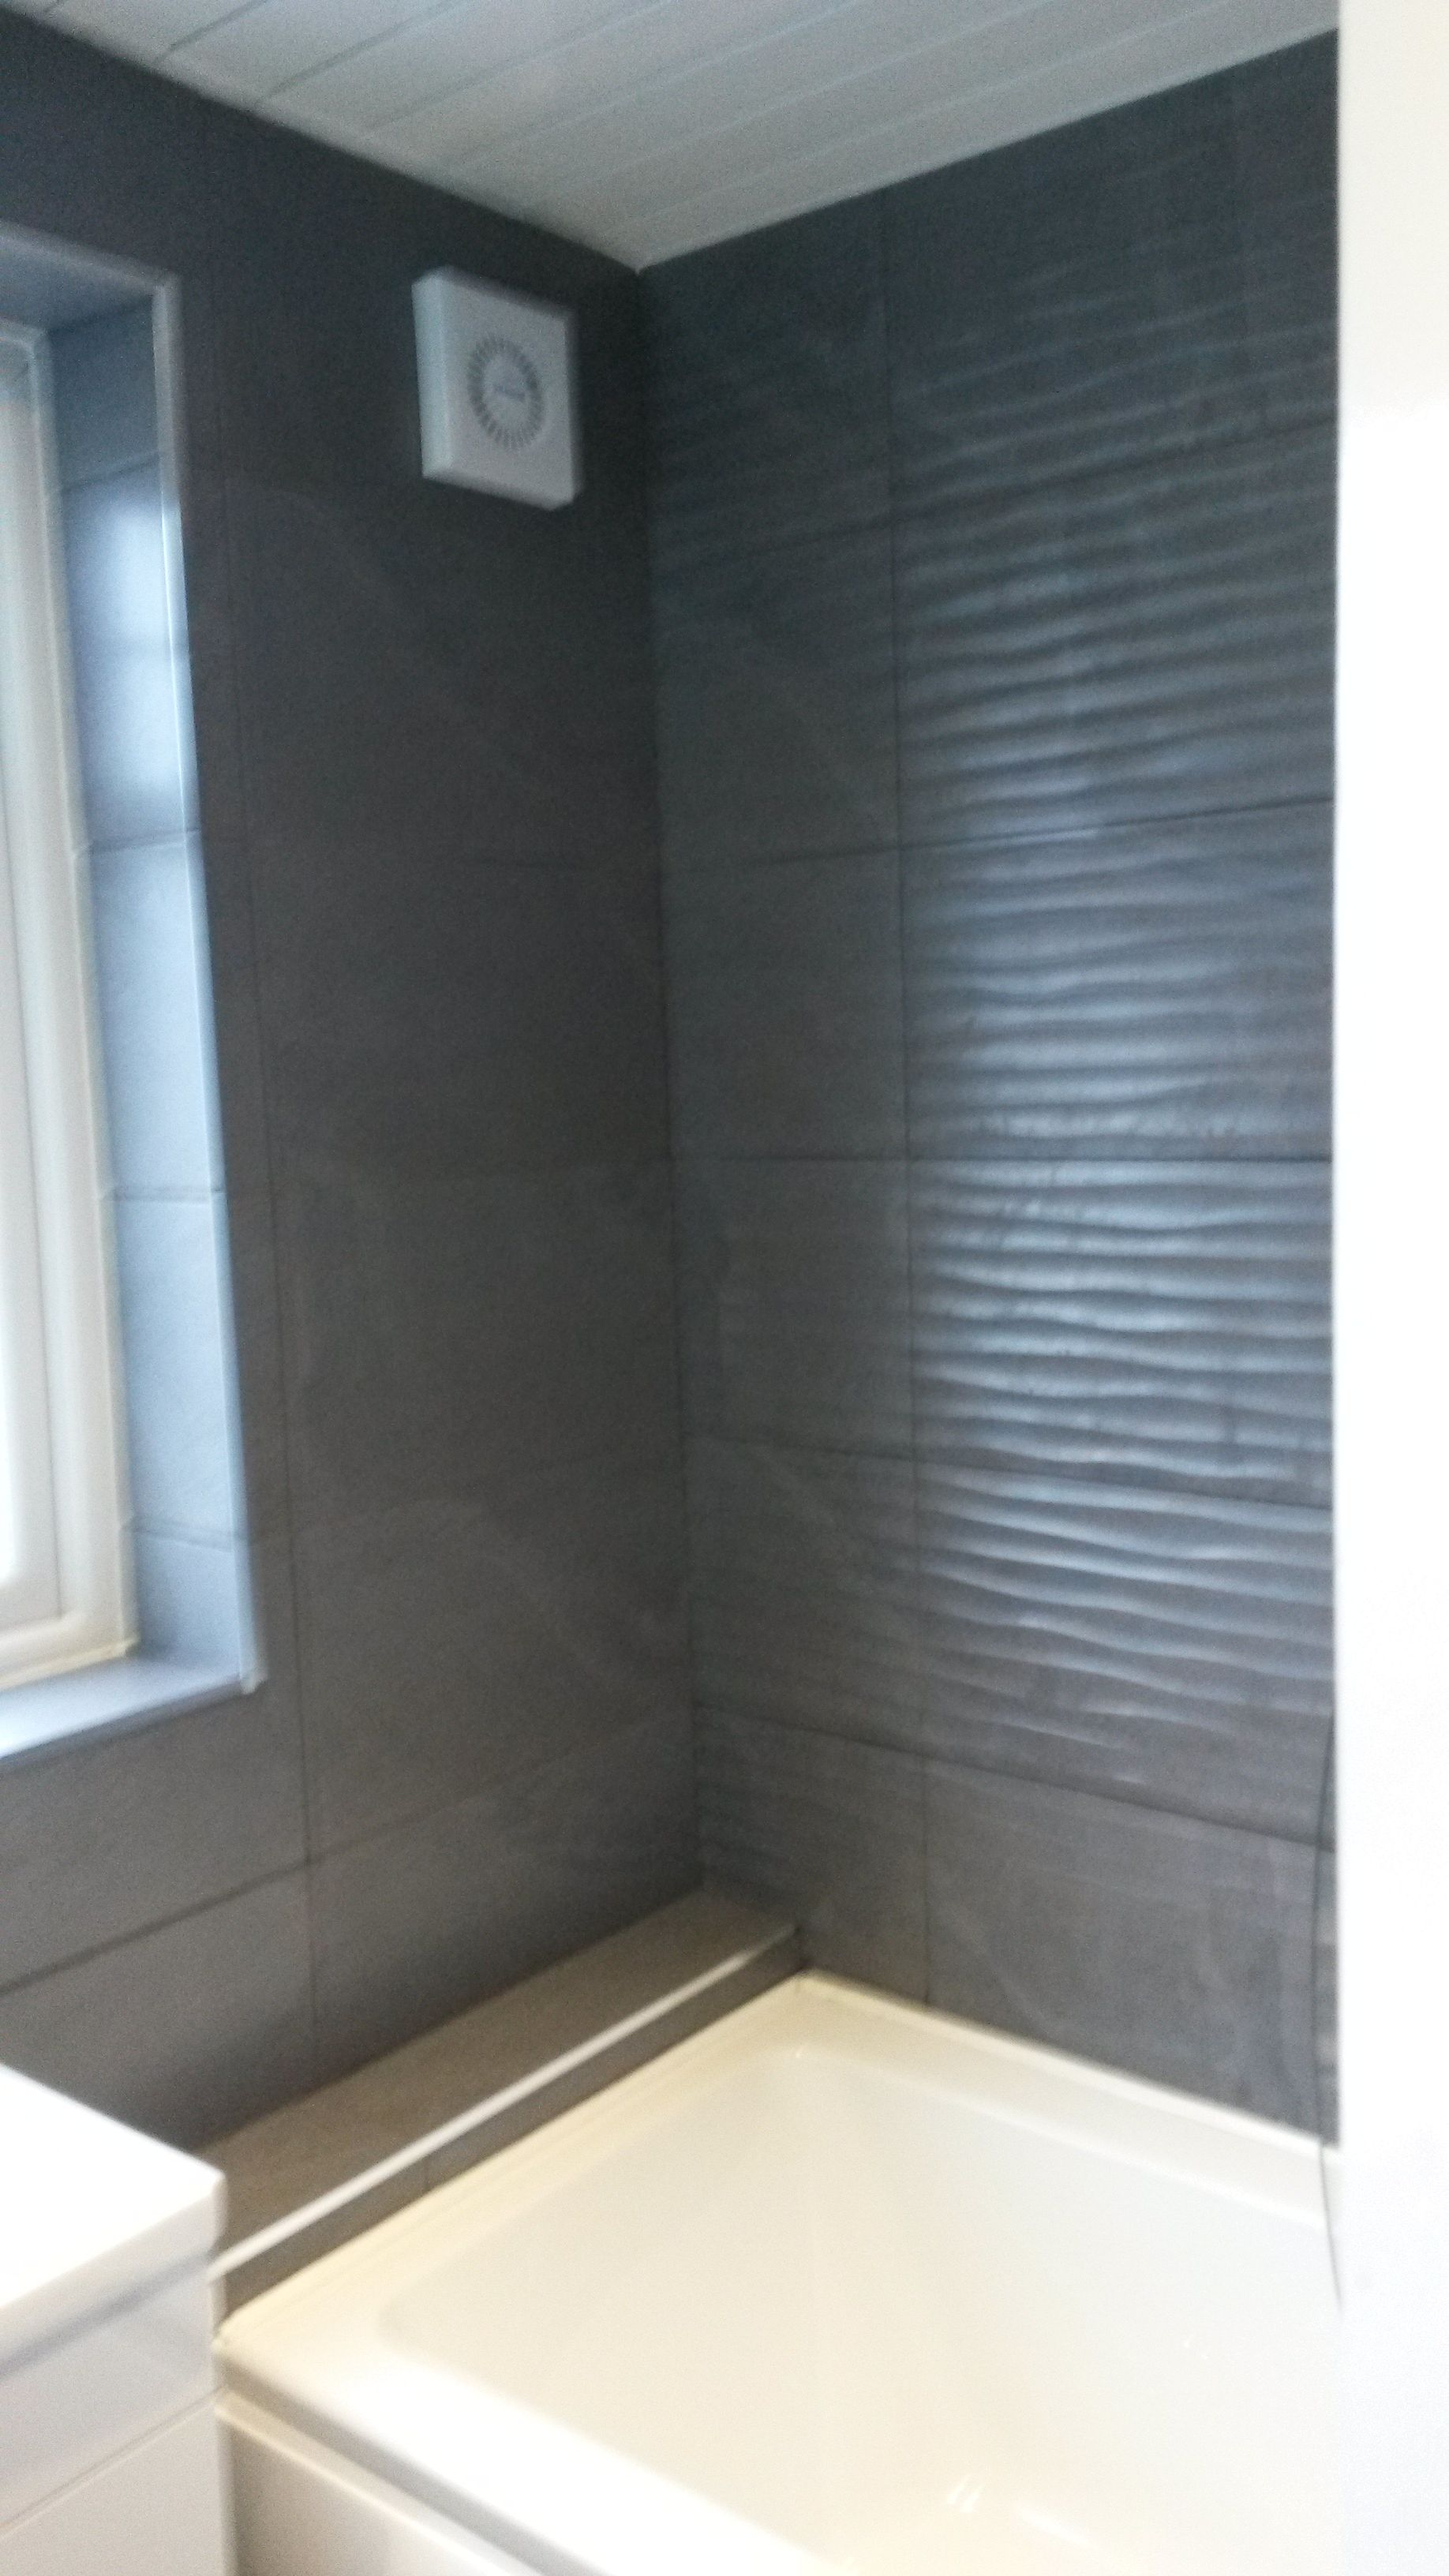 Love the vitra british stone antrasit matt wave 600x300x9mm wall love the vitra british stone antrasit matt wave 600x300x9mm wall tile with the light ceiling dailygadgetfo Image collections